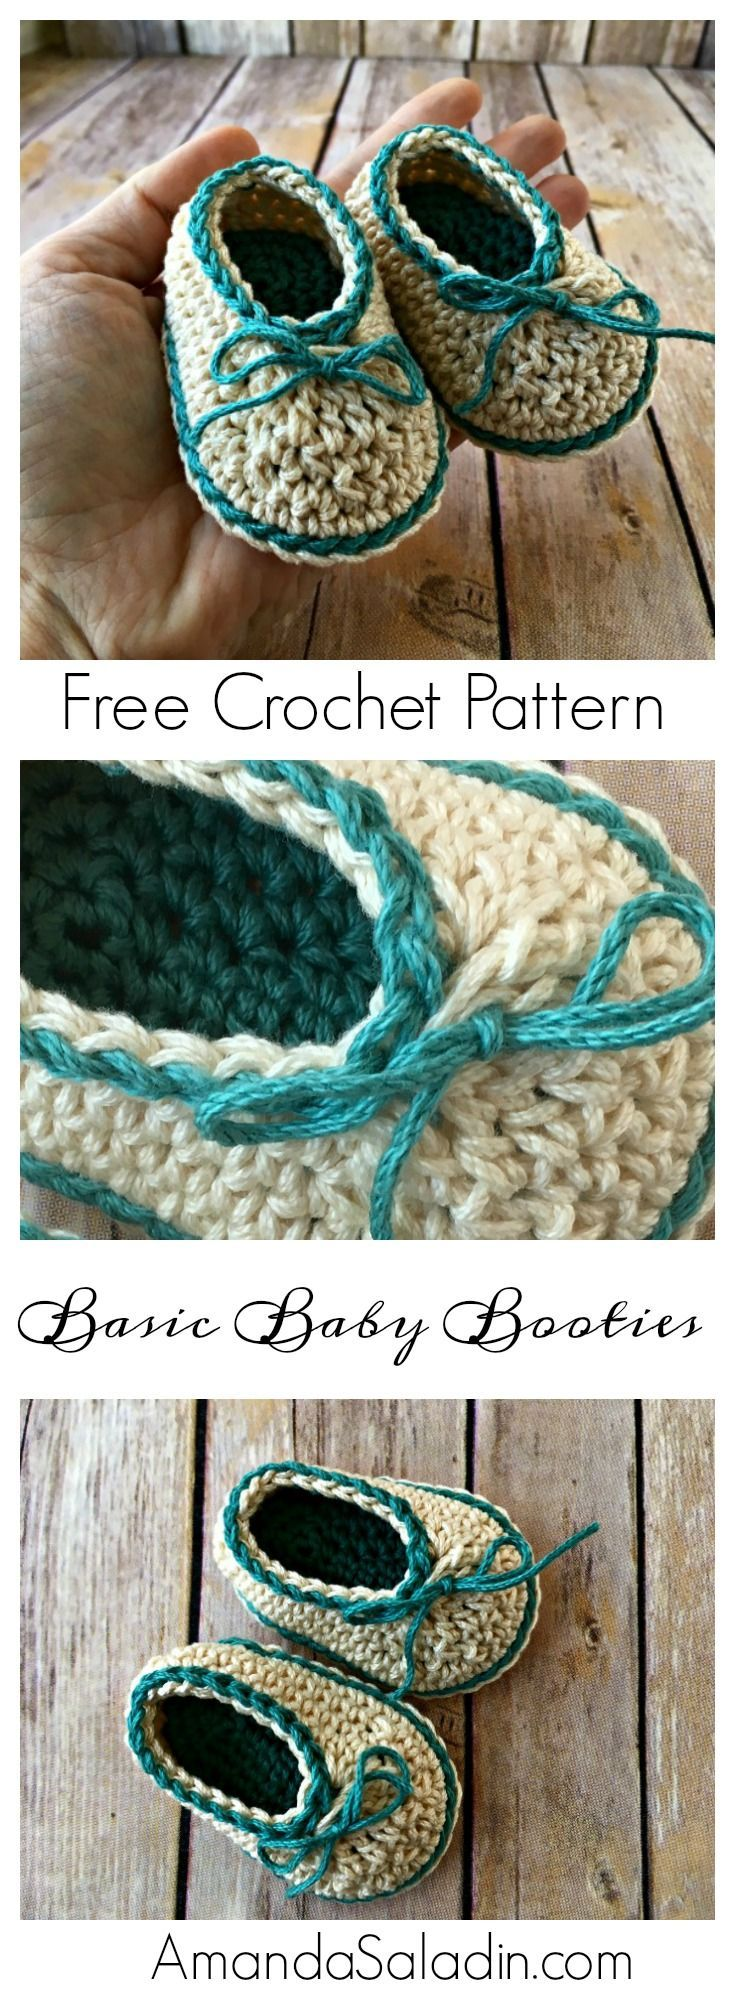 Basic Baby Booties - Free Crochet Pattern   Babybody, Gestricktes ...